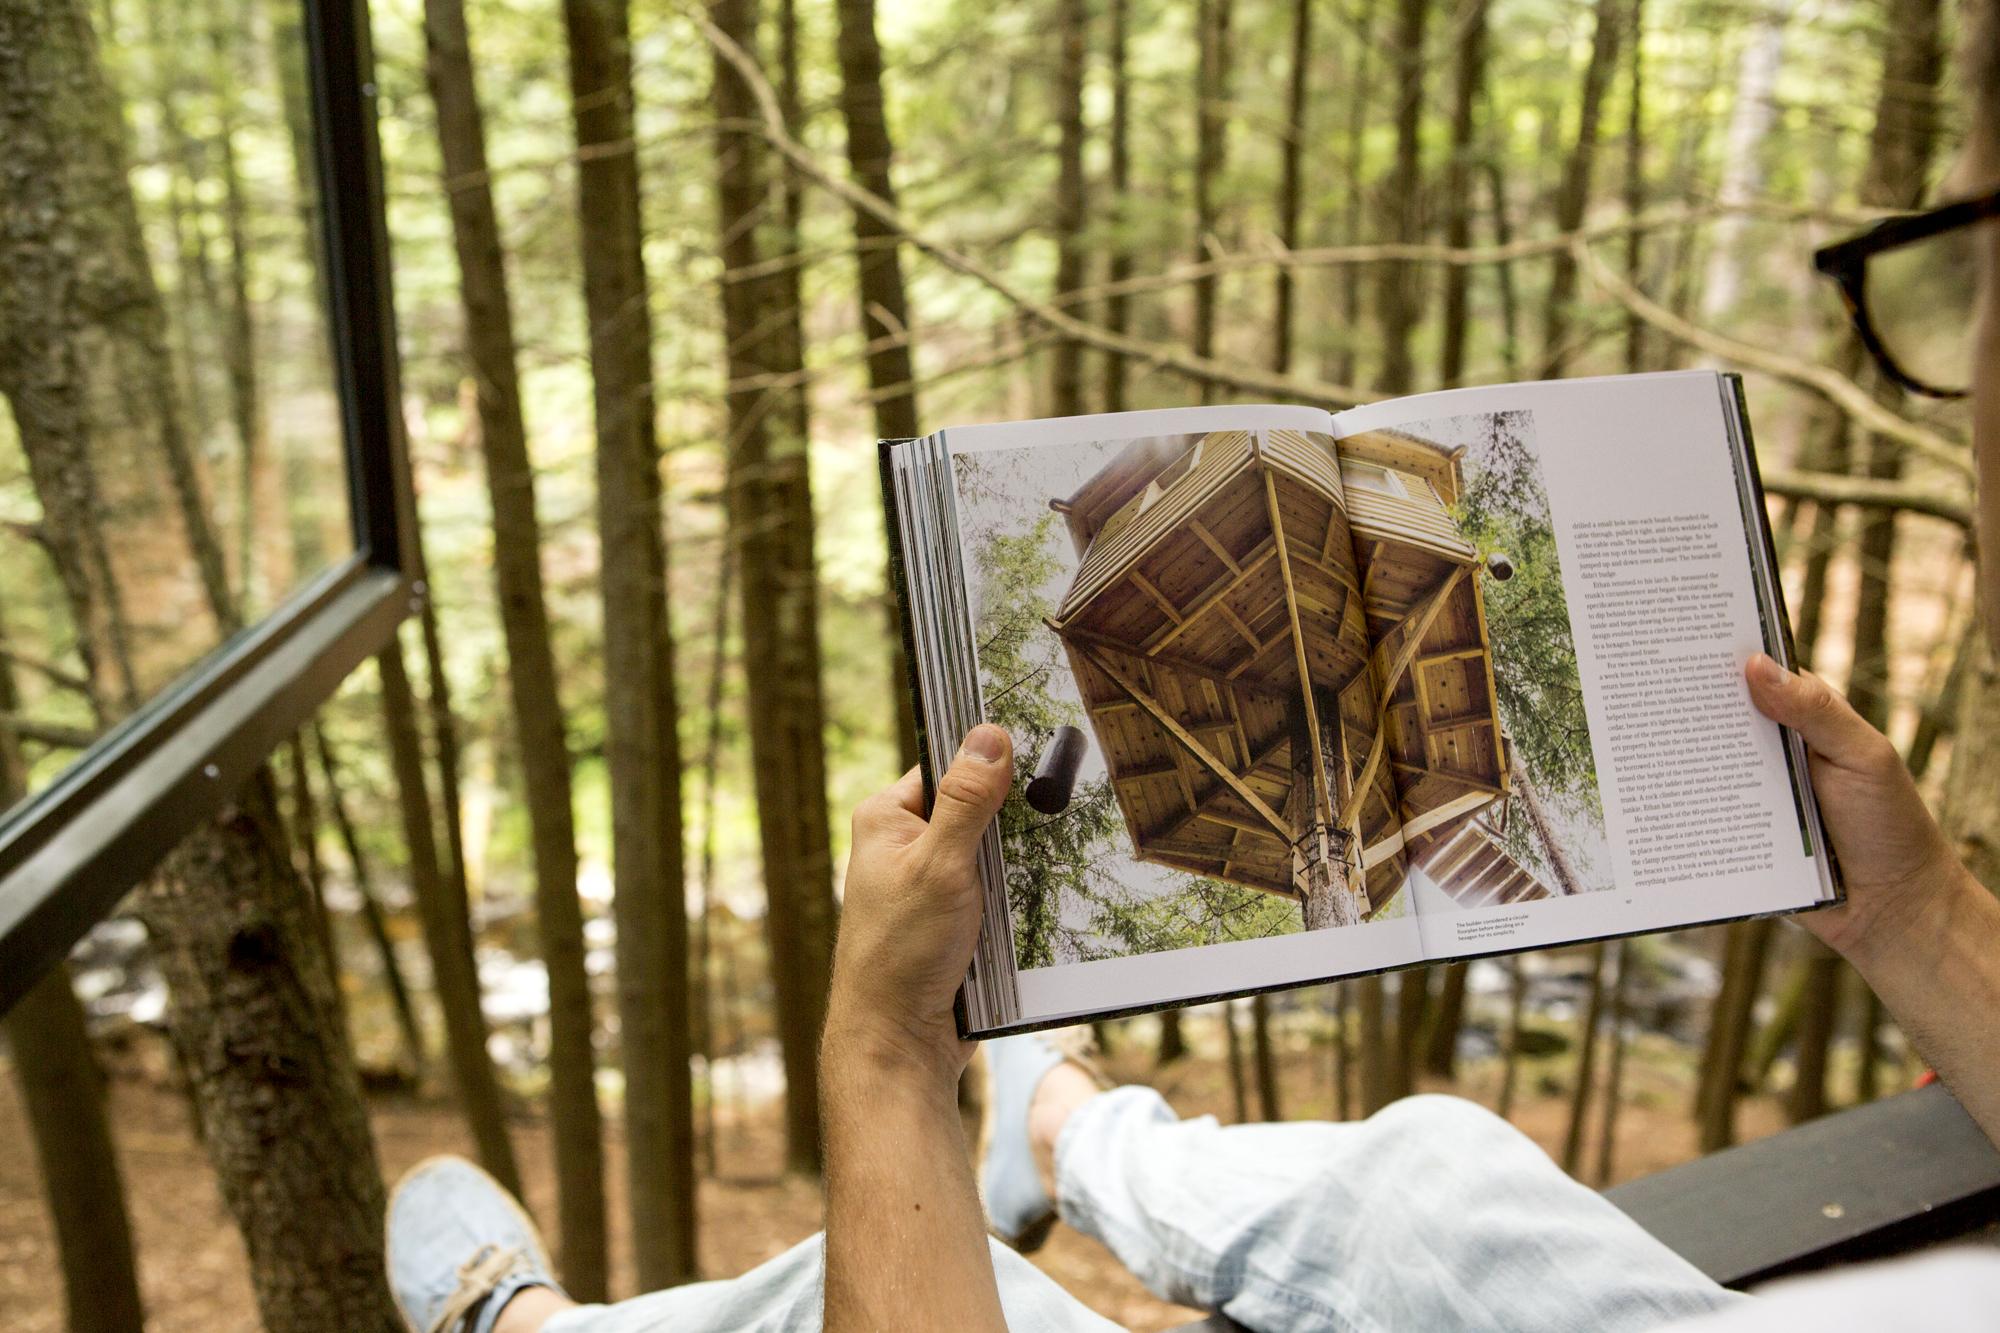 beaver-brook-cabin-porn-book-6